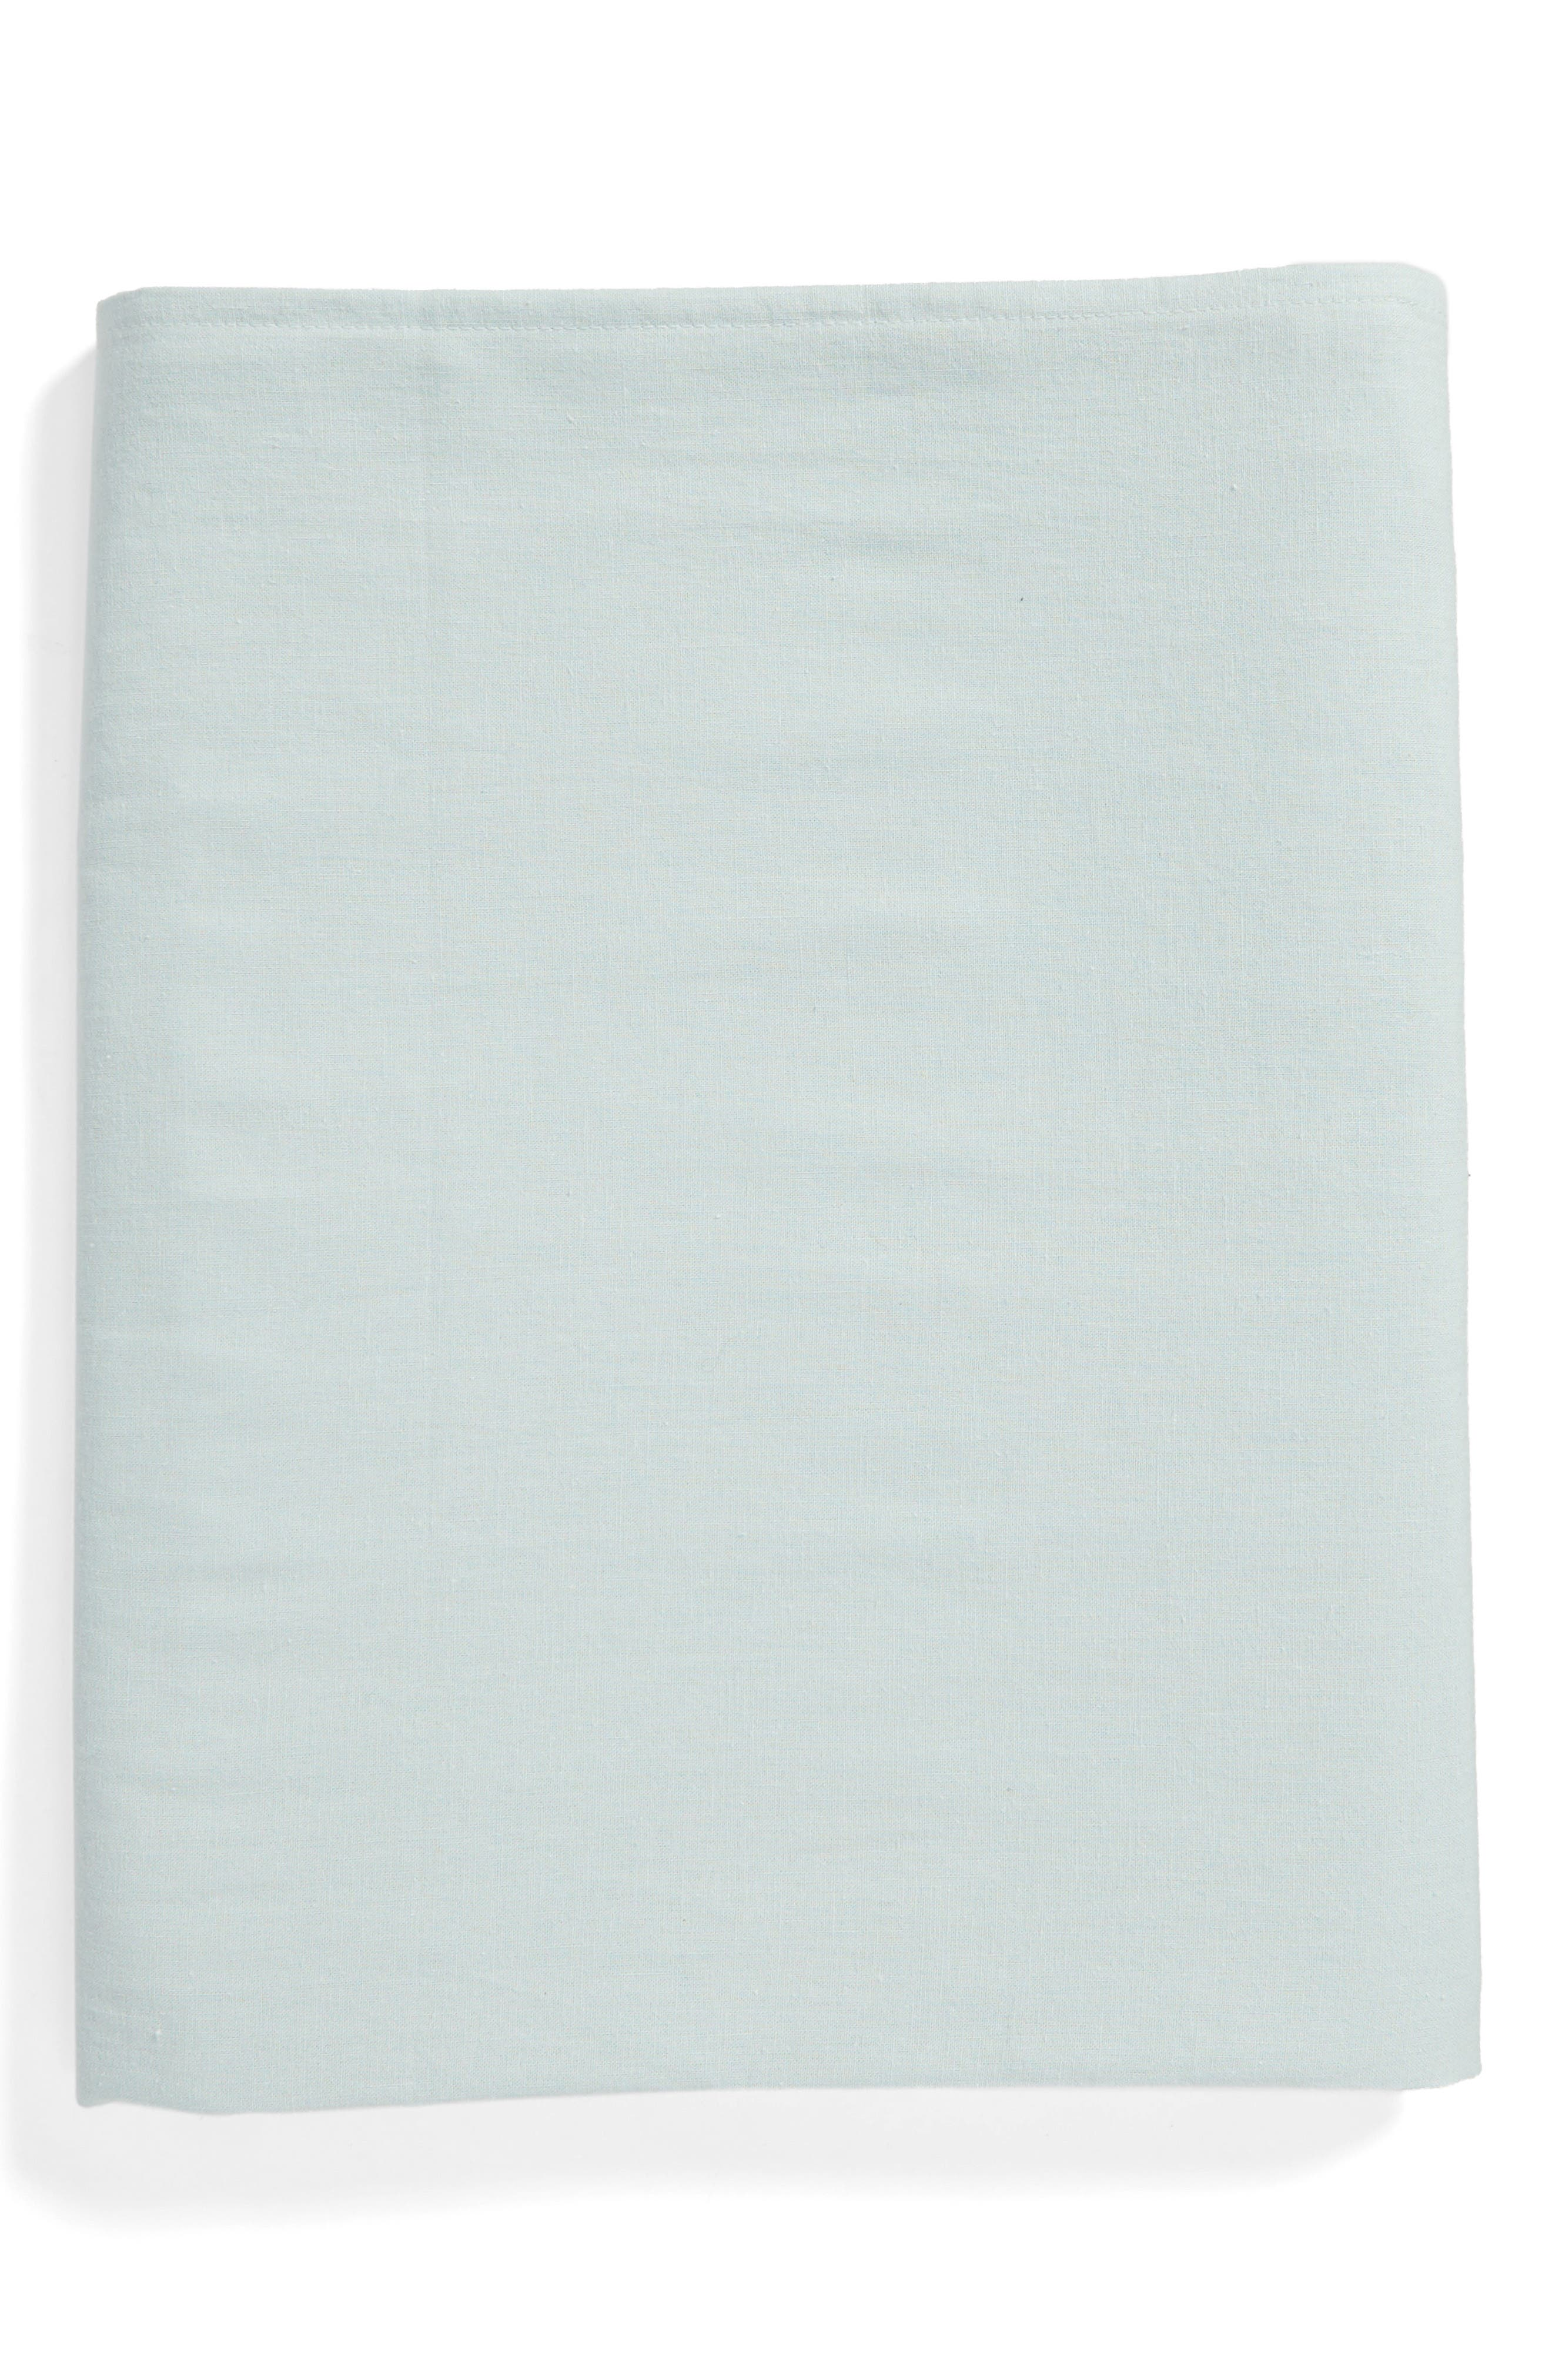 Washed Linen Tablecloth,                             Main thumbnail 4, color,